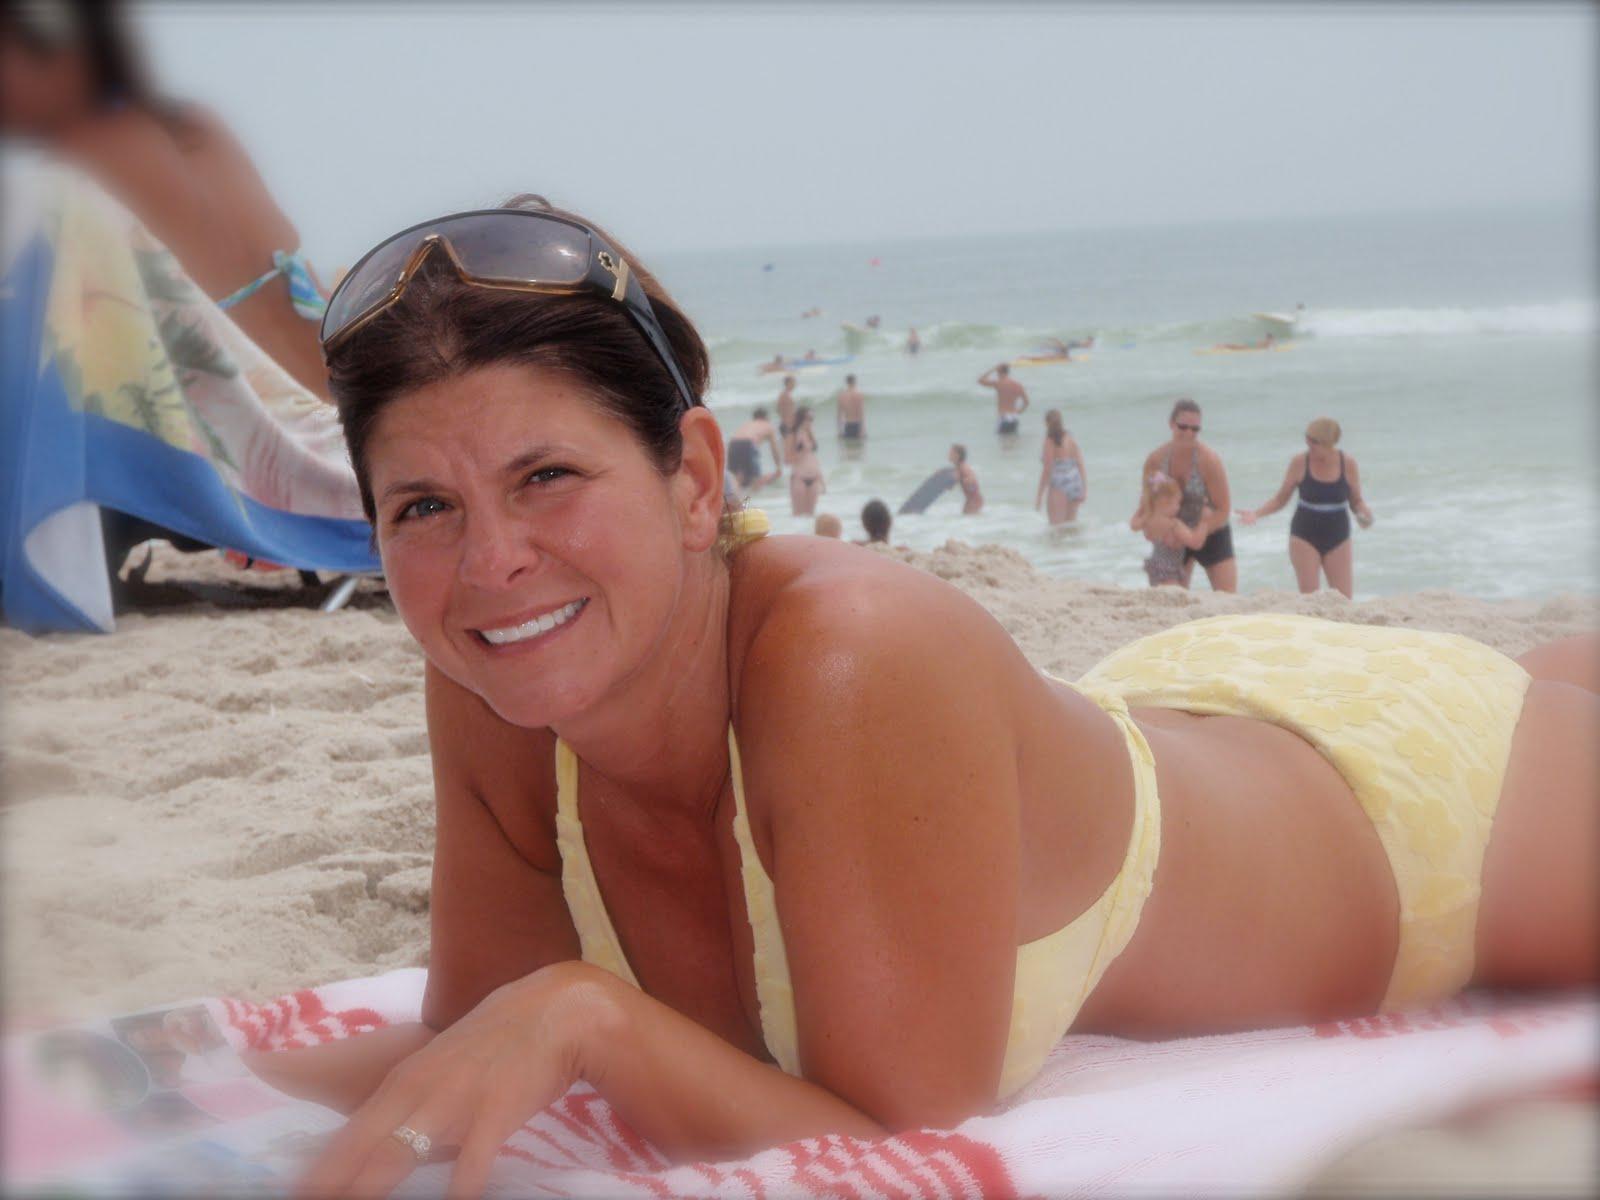 Swingers in elizabeth nj Discover New Jersey Swingers Around You,